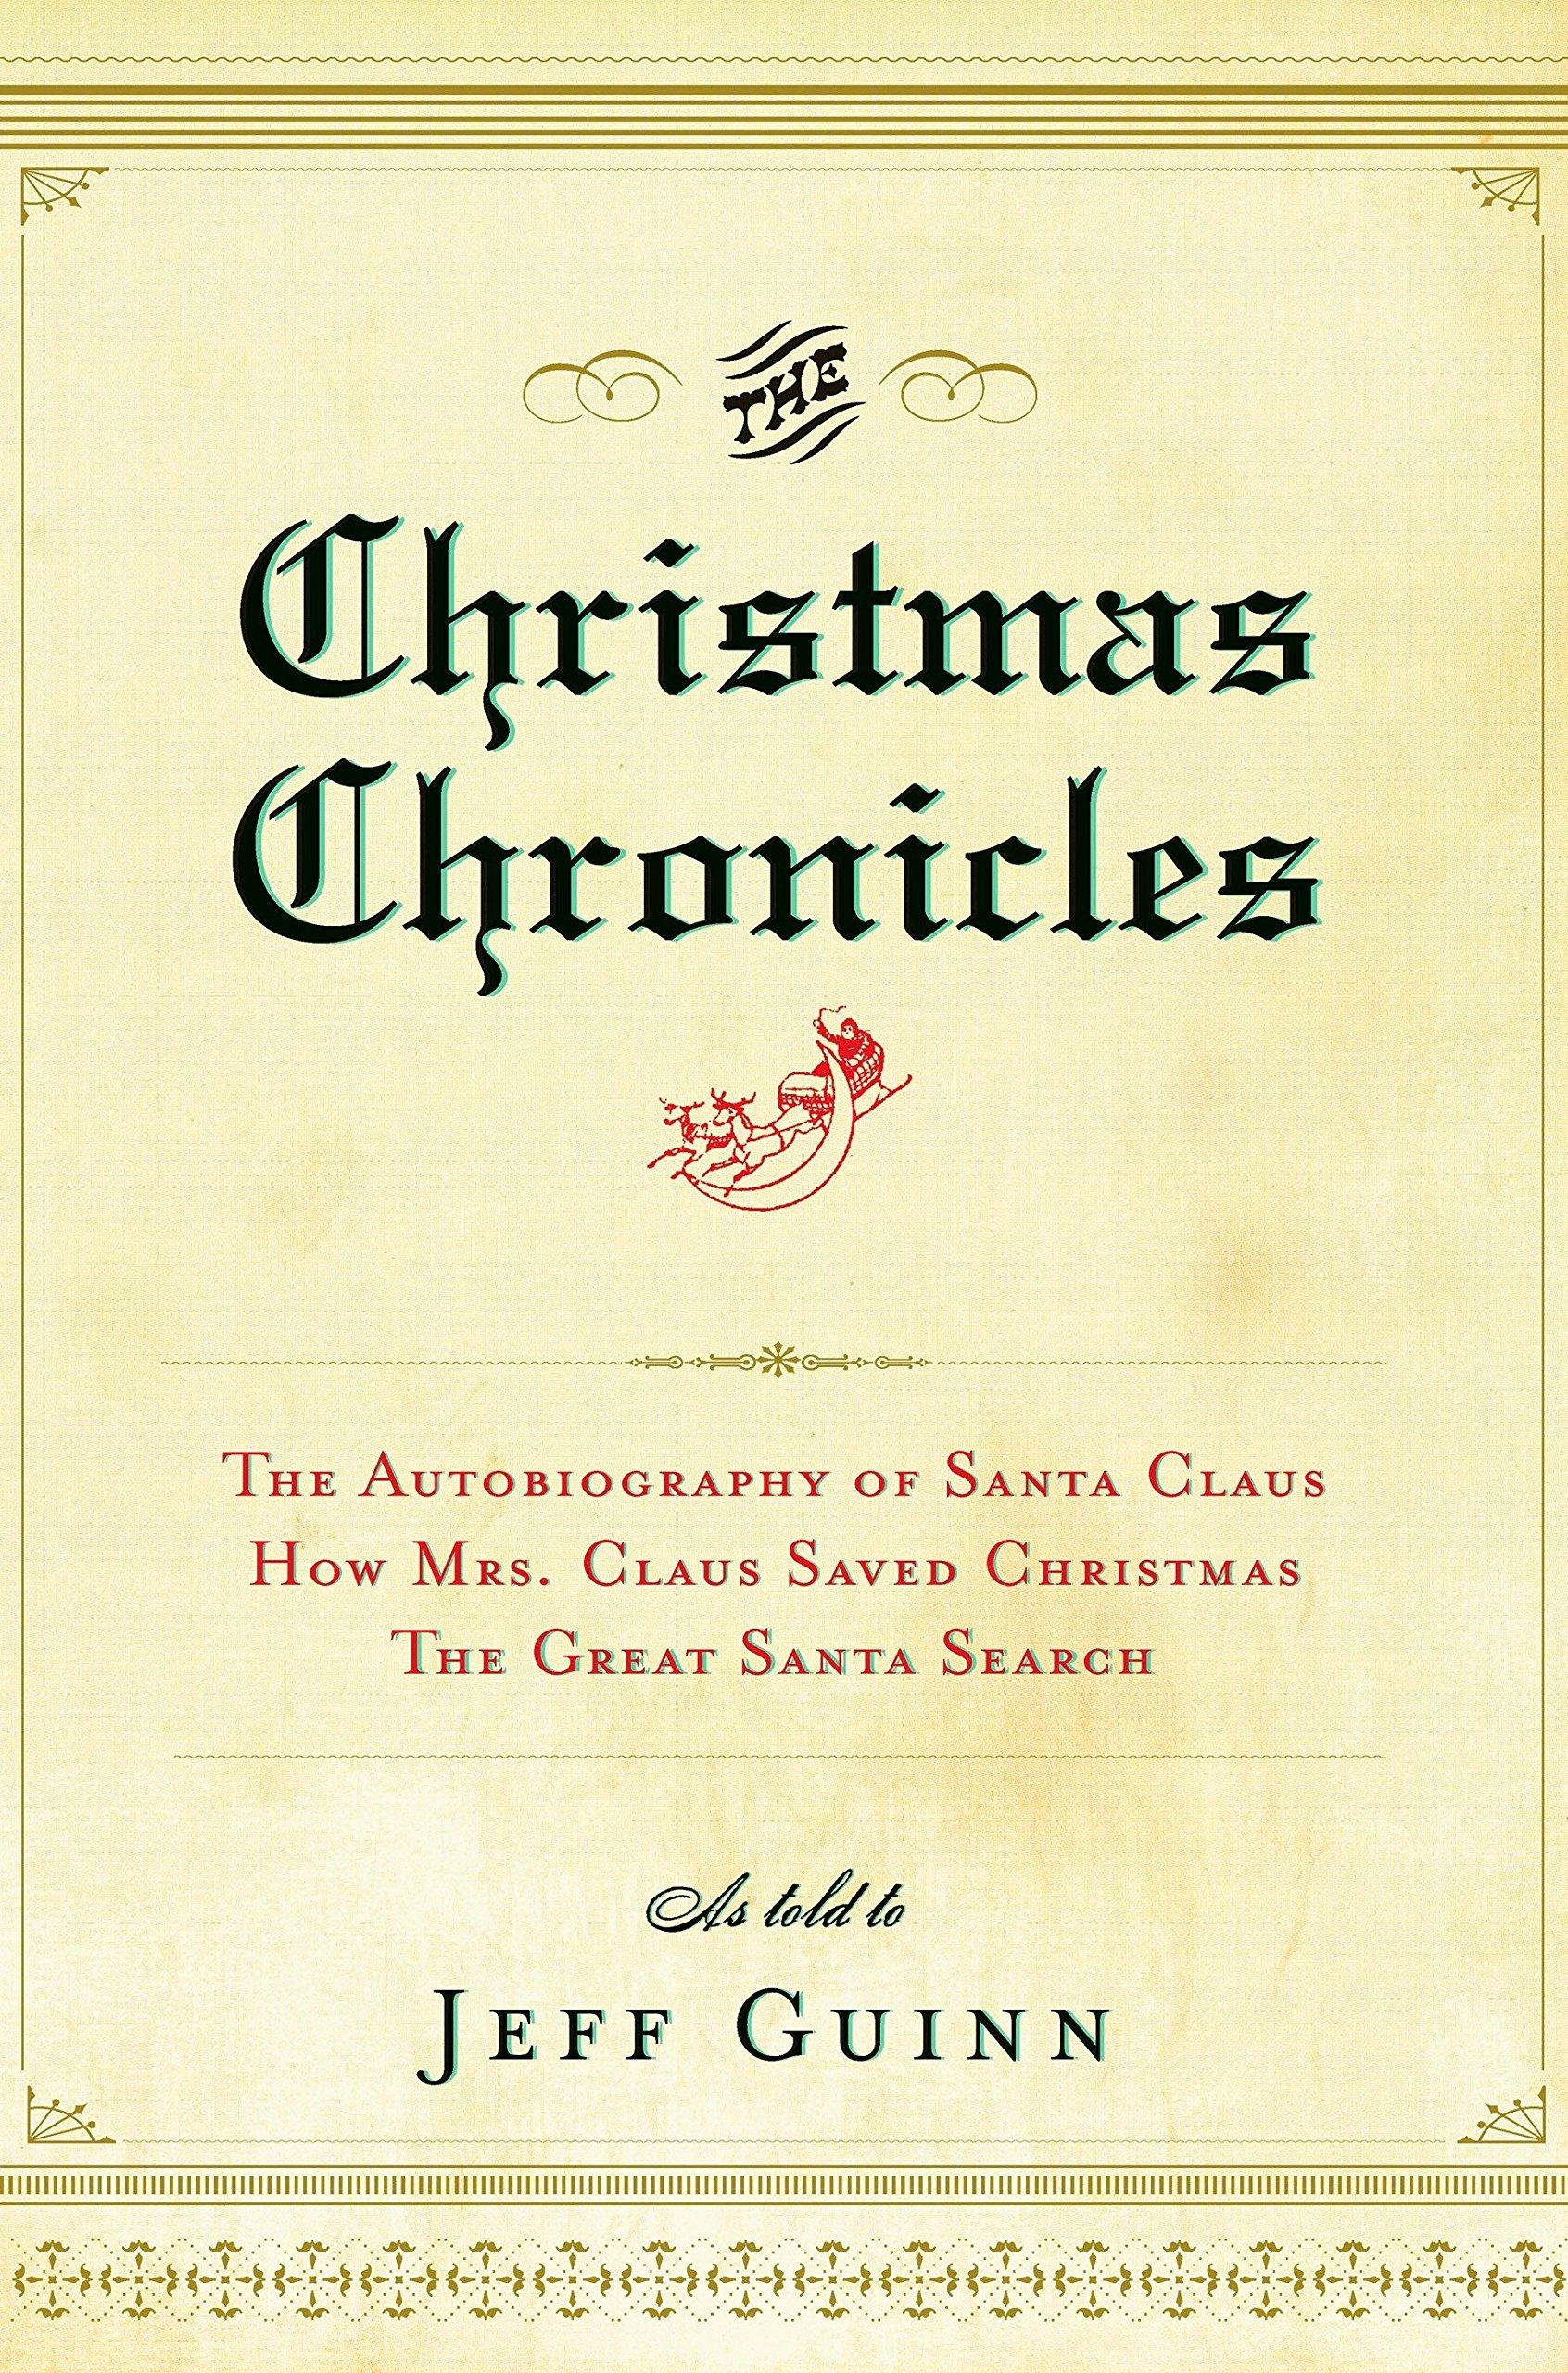 Christmas Chronicles Mrs Claus.The Christmas Chronicles Jeff Guinn 9781585426690 Amazon